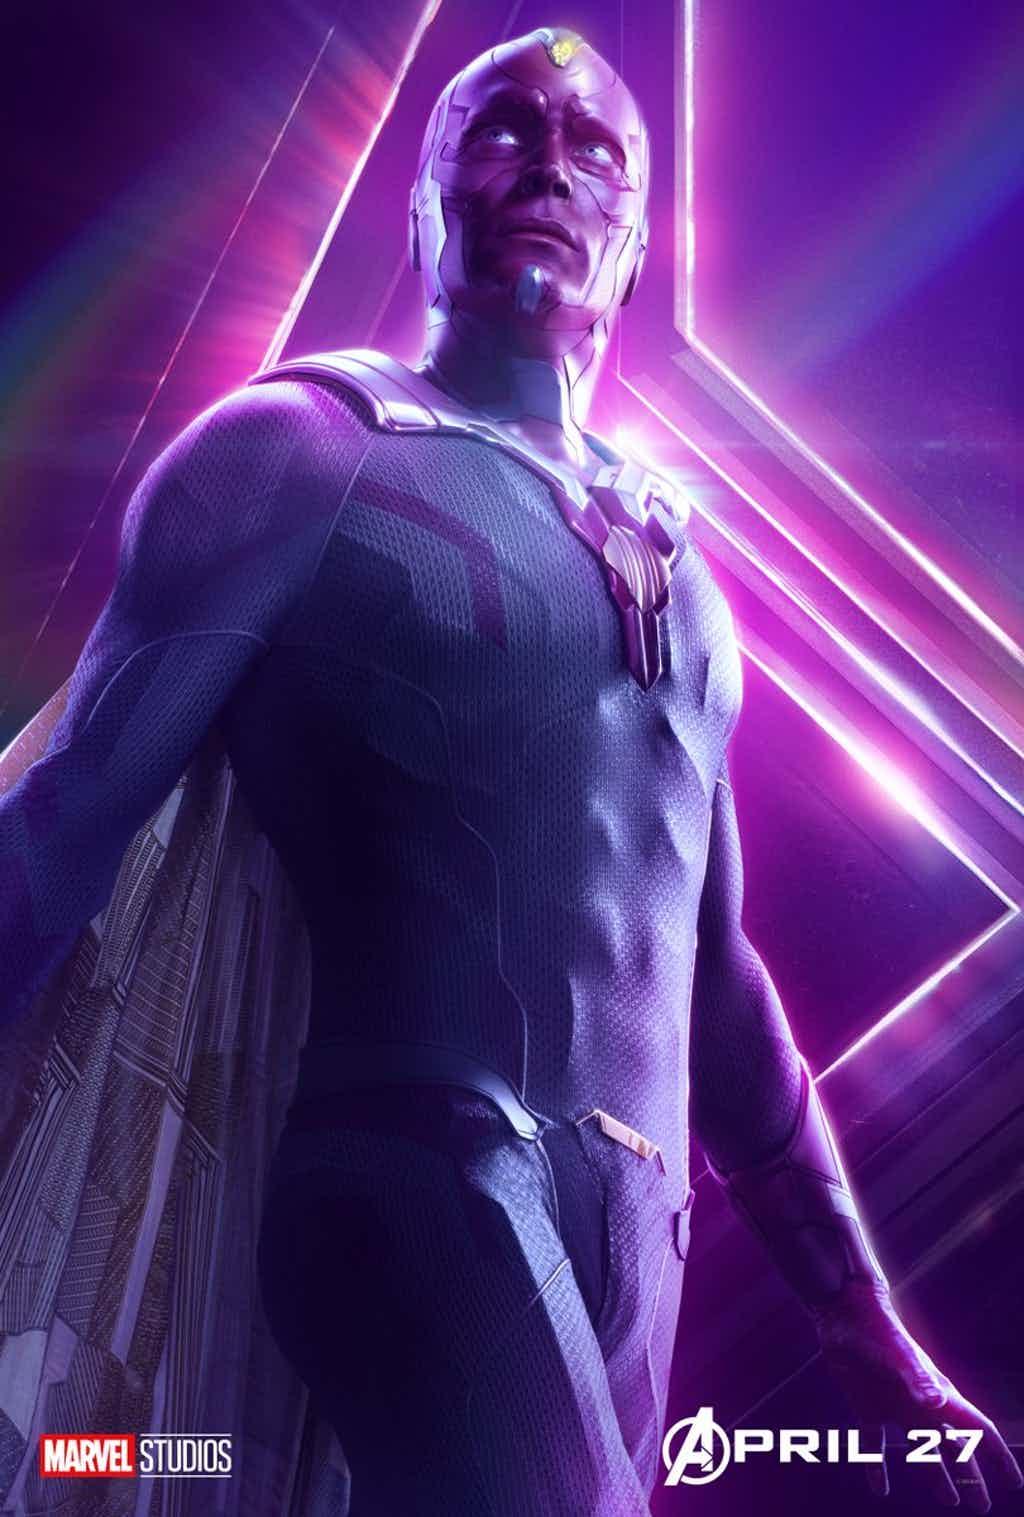 szmk_marvel_infinity_war_vegtelen_haboru_bosszuallok_avengers_ironman_hulk_thor_captainamaerica_guardians_galaxy_18.jpg